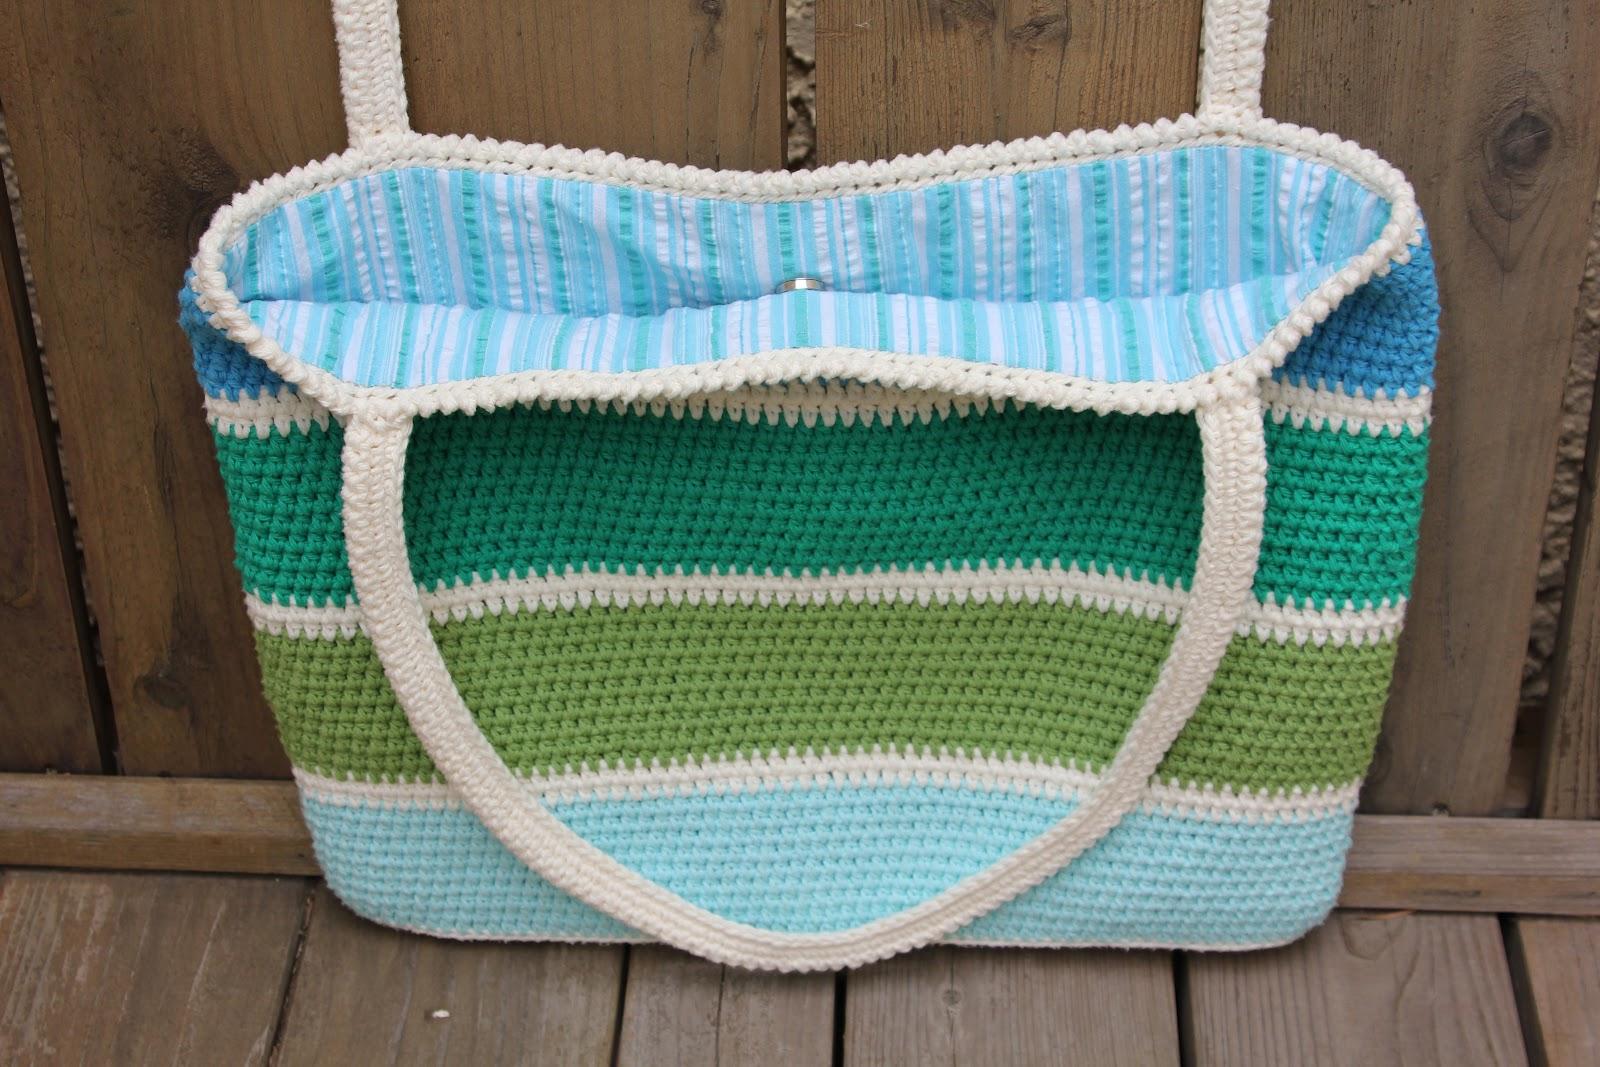 handmade&homemade: Striped Summer Tote